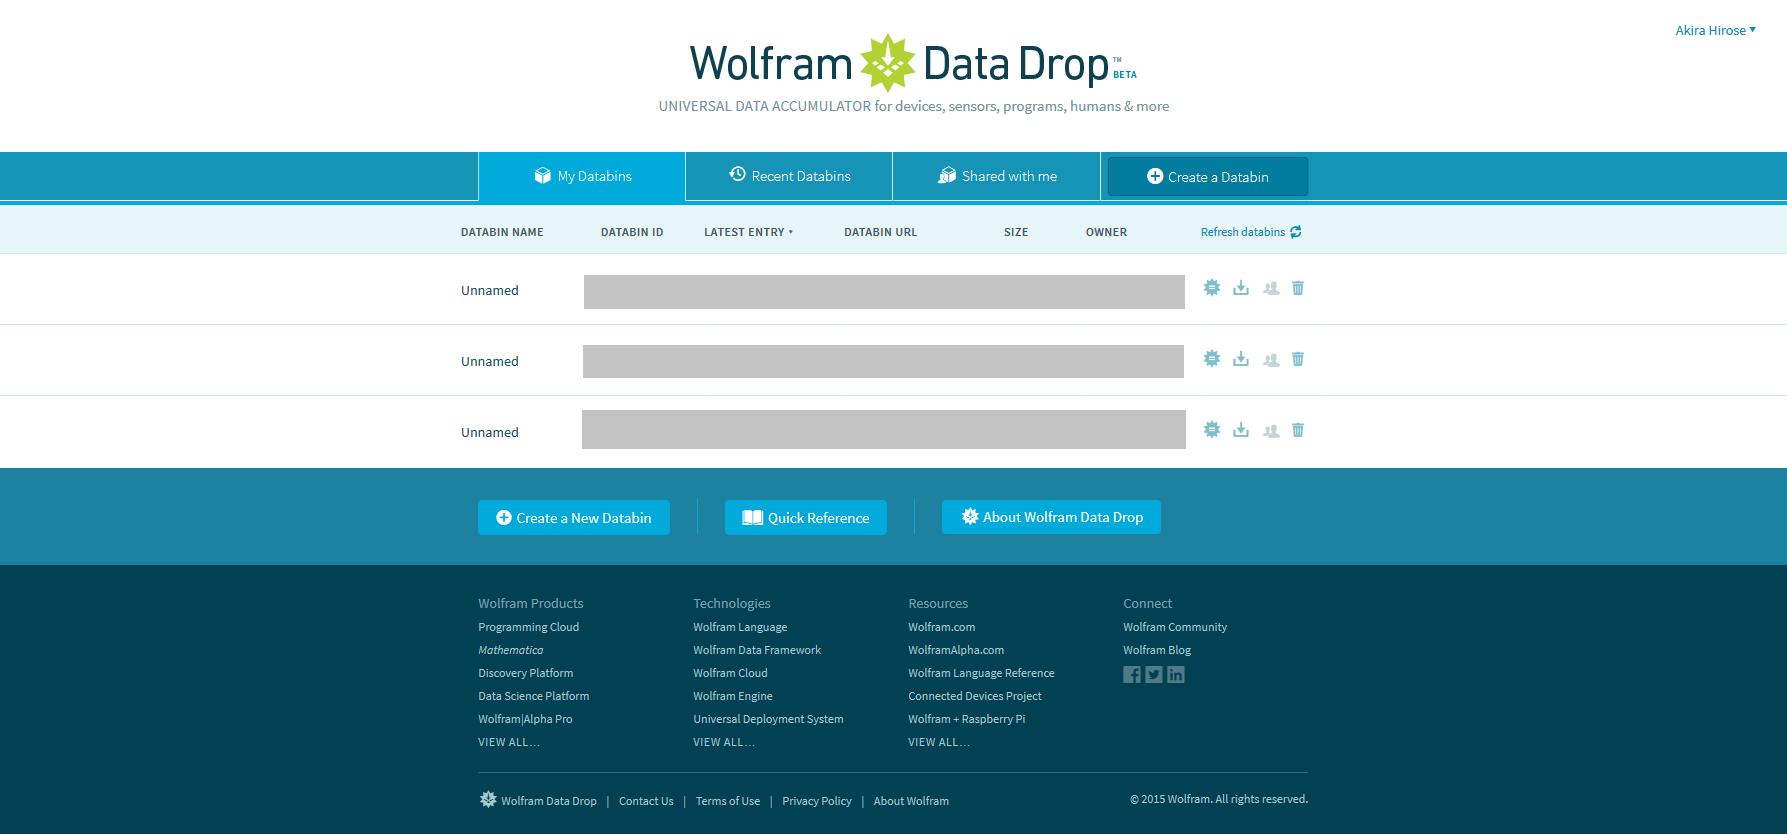 My Databins - Wolfram Data Drop.png